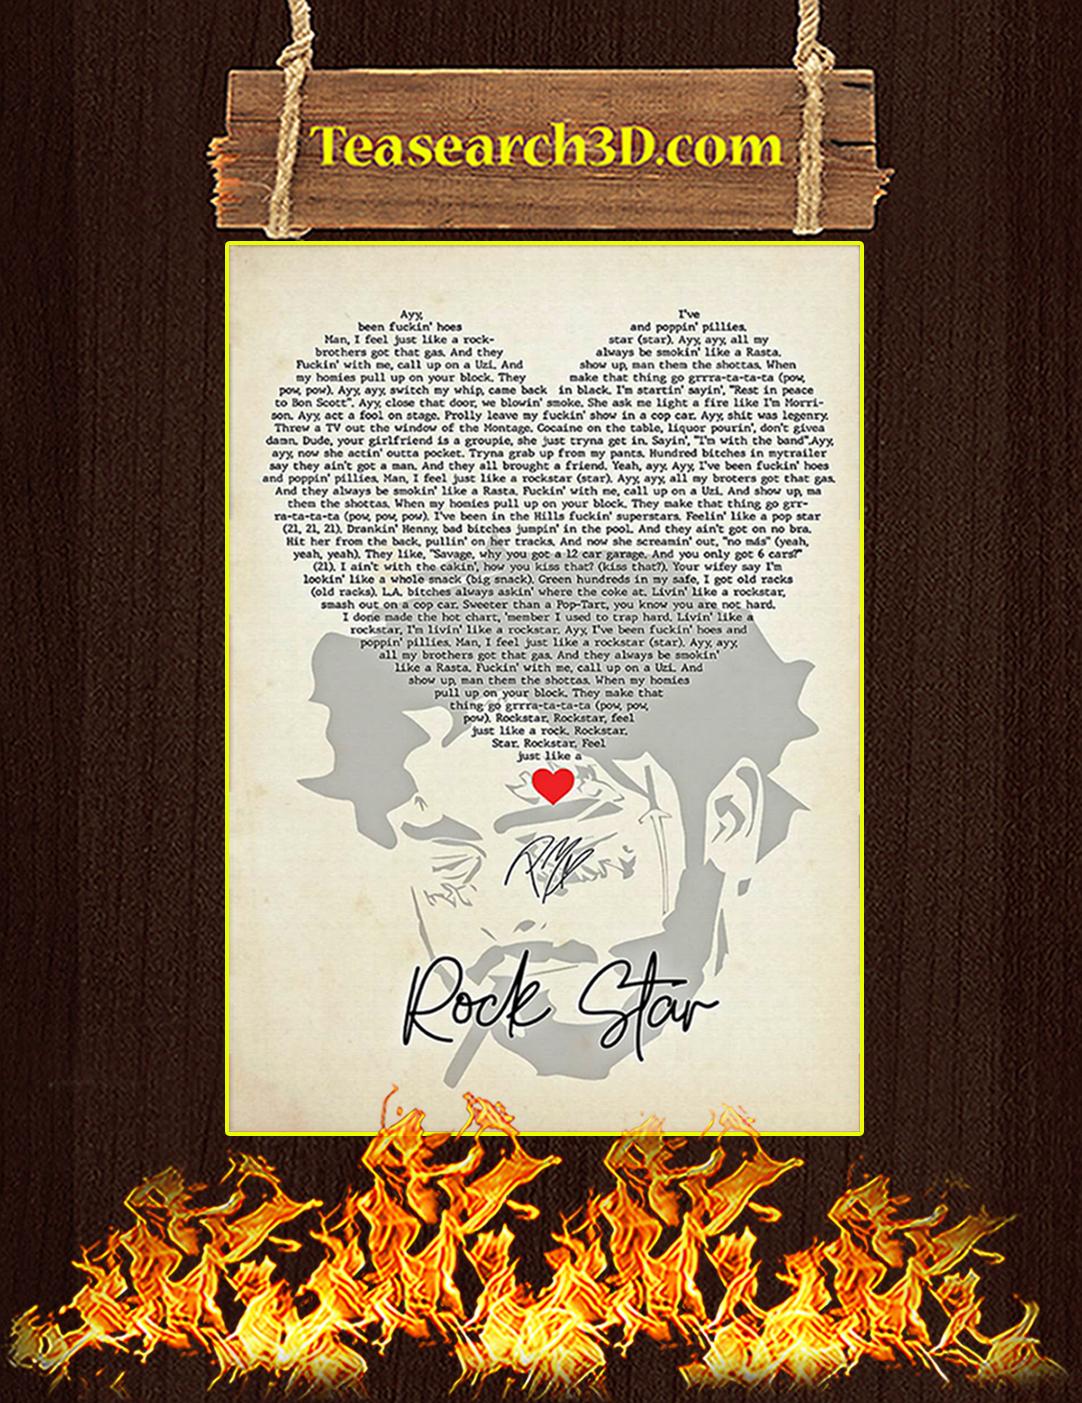 Rock star signature poster A2